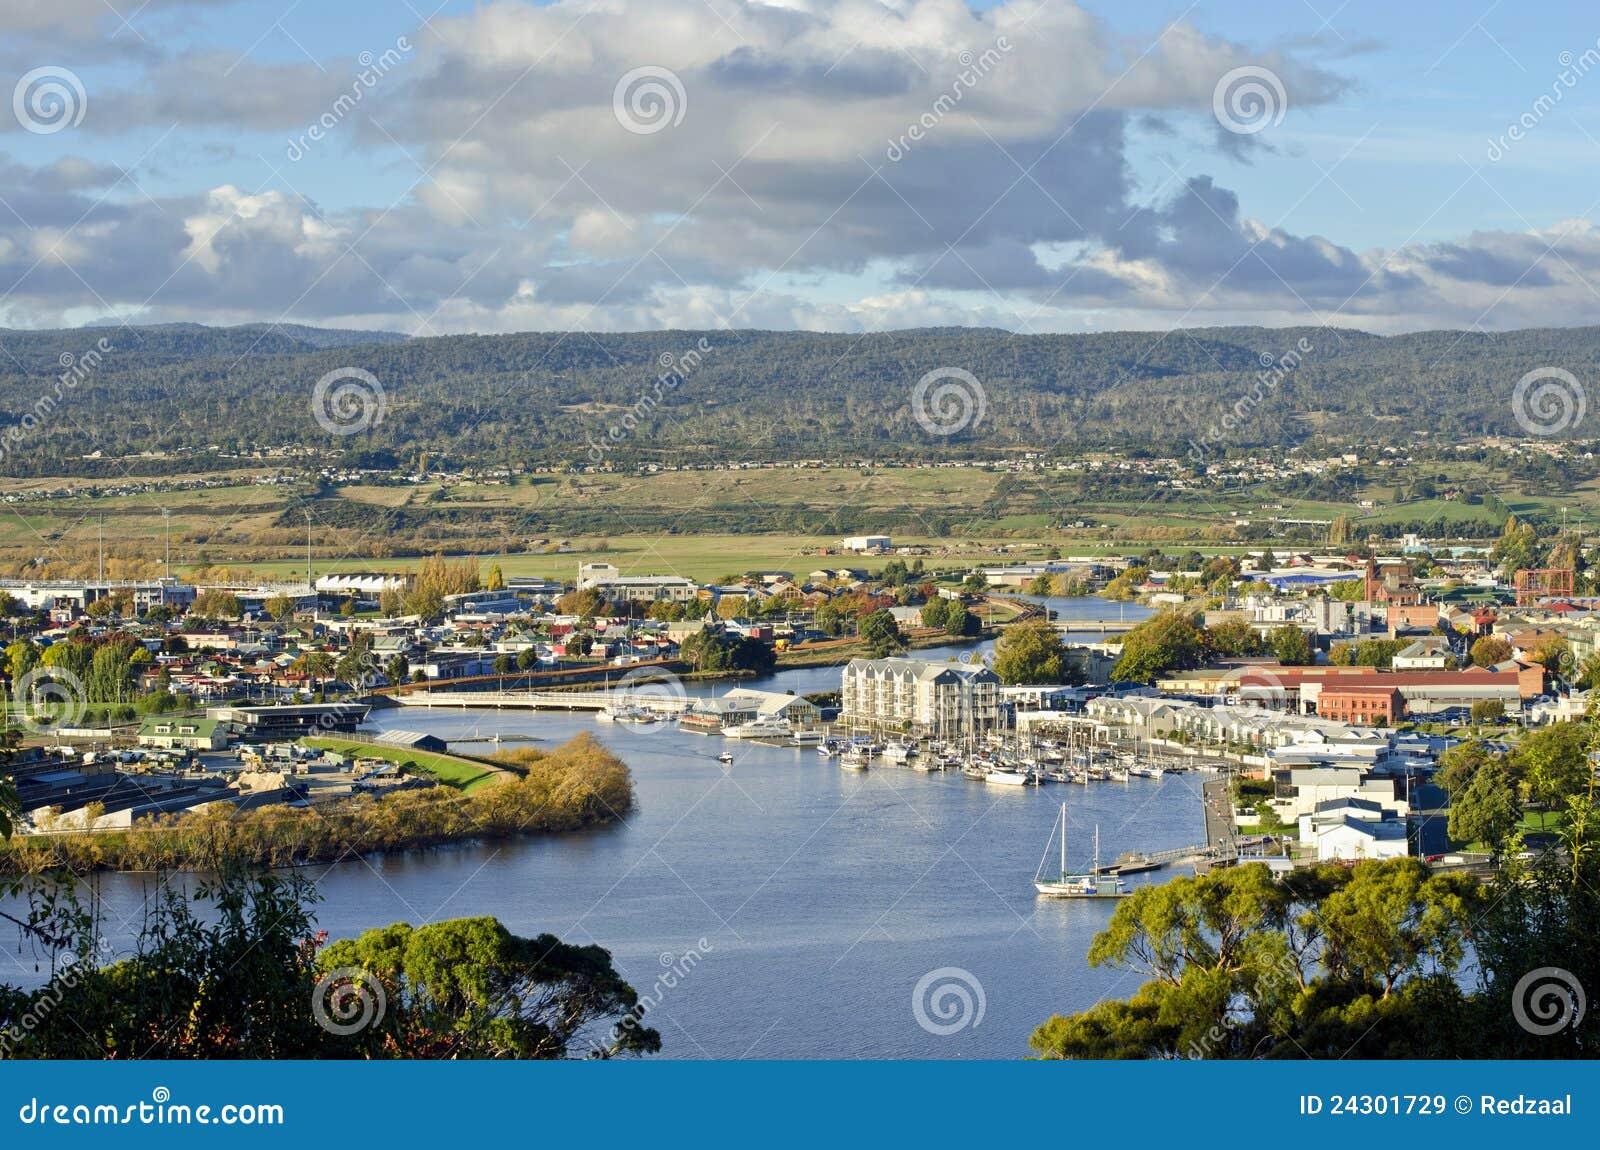 Launceston Australia  city photos gallery : Launceston In Tasmania, Australia Royalty Free Stock Images Image ...